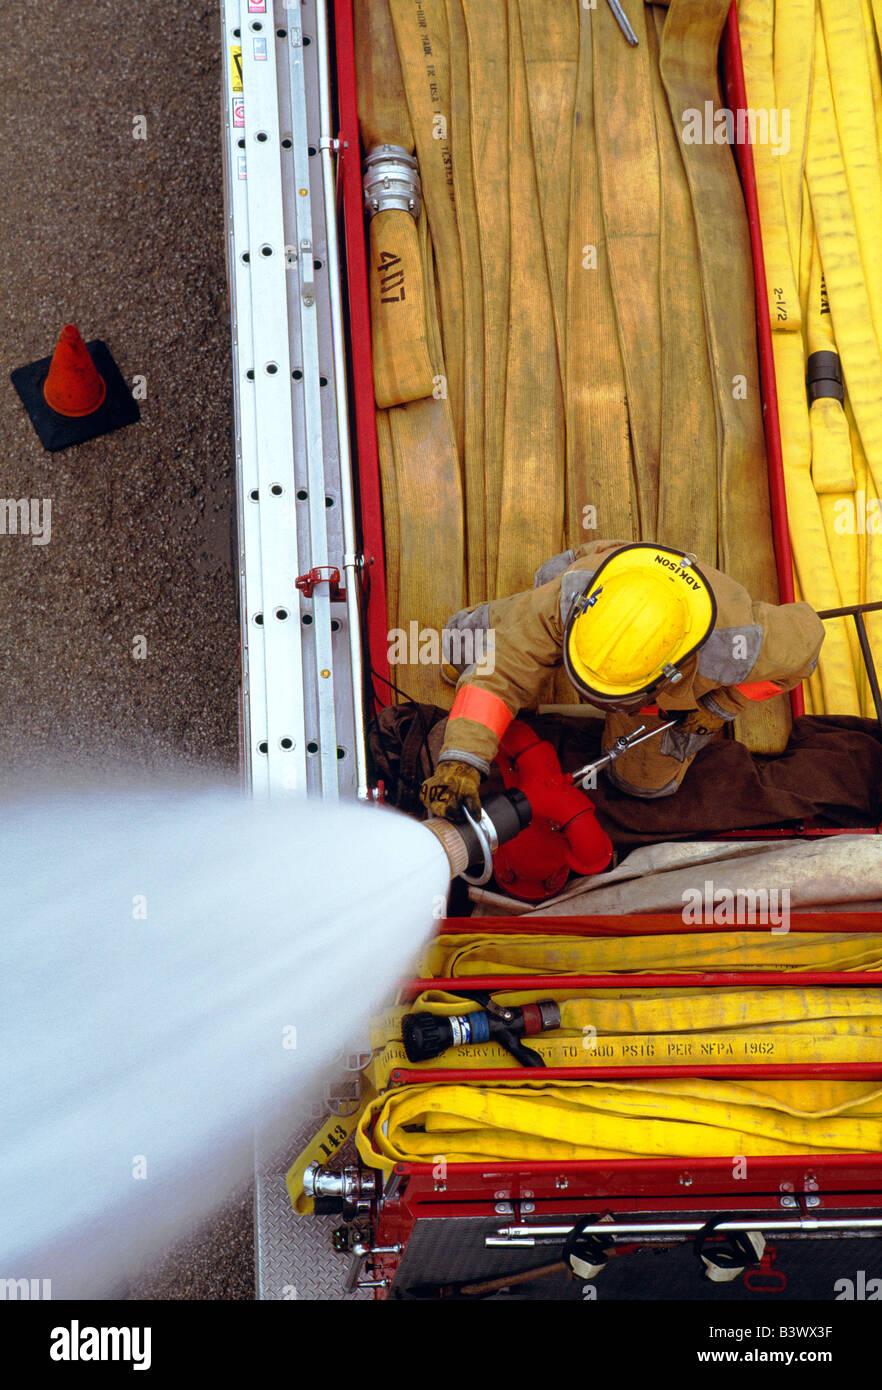 Fireman With Hose Stock Photos & Fireman With Hose Stock